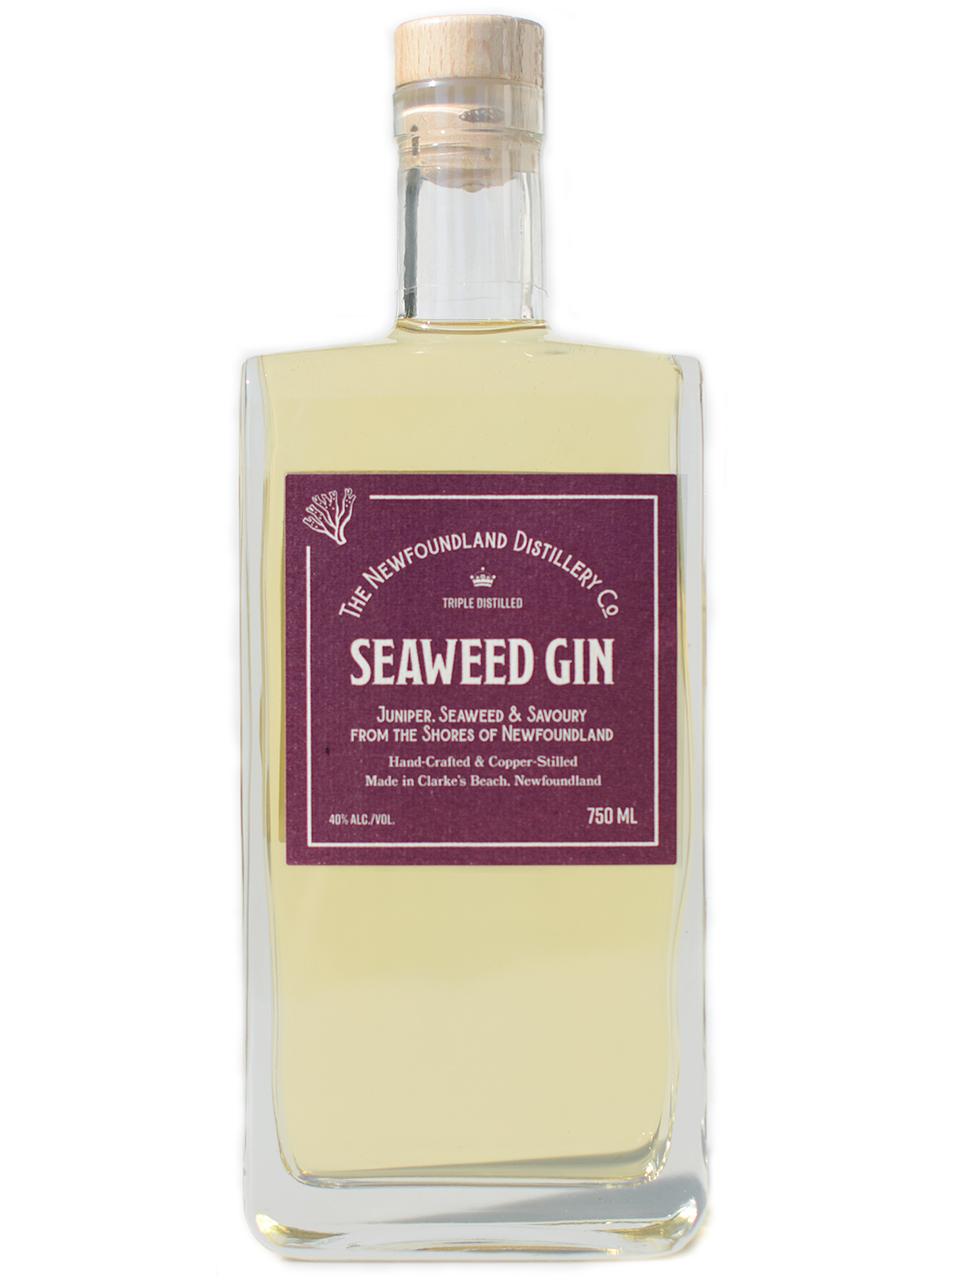 Newfoundland Distillery Co. Seaweed Gin